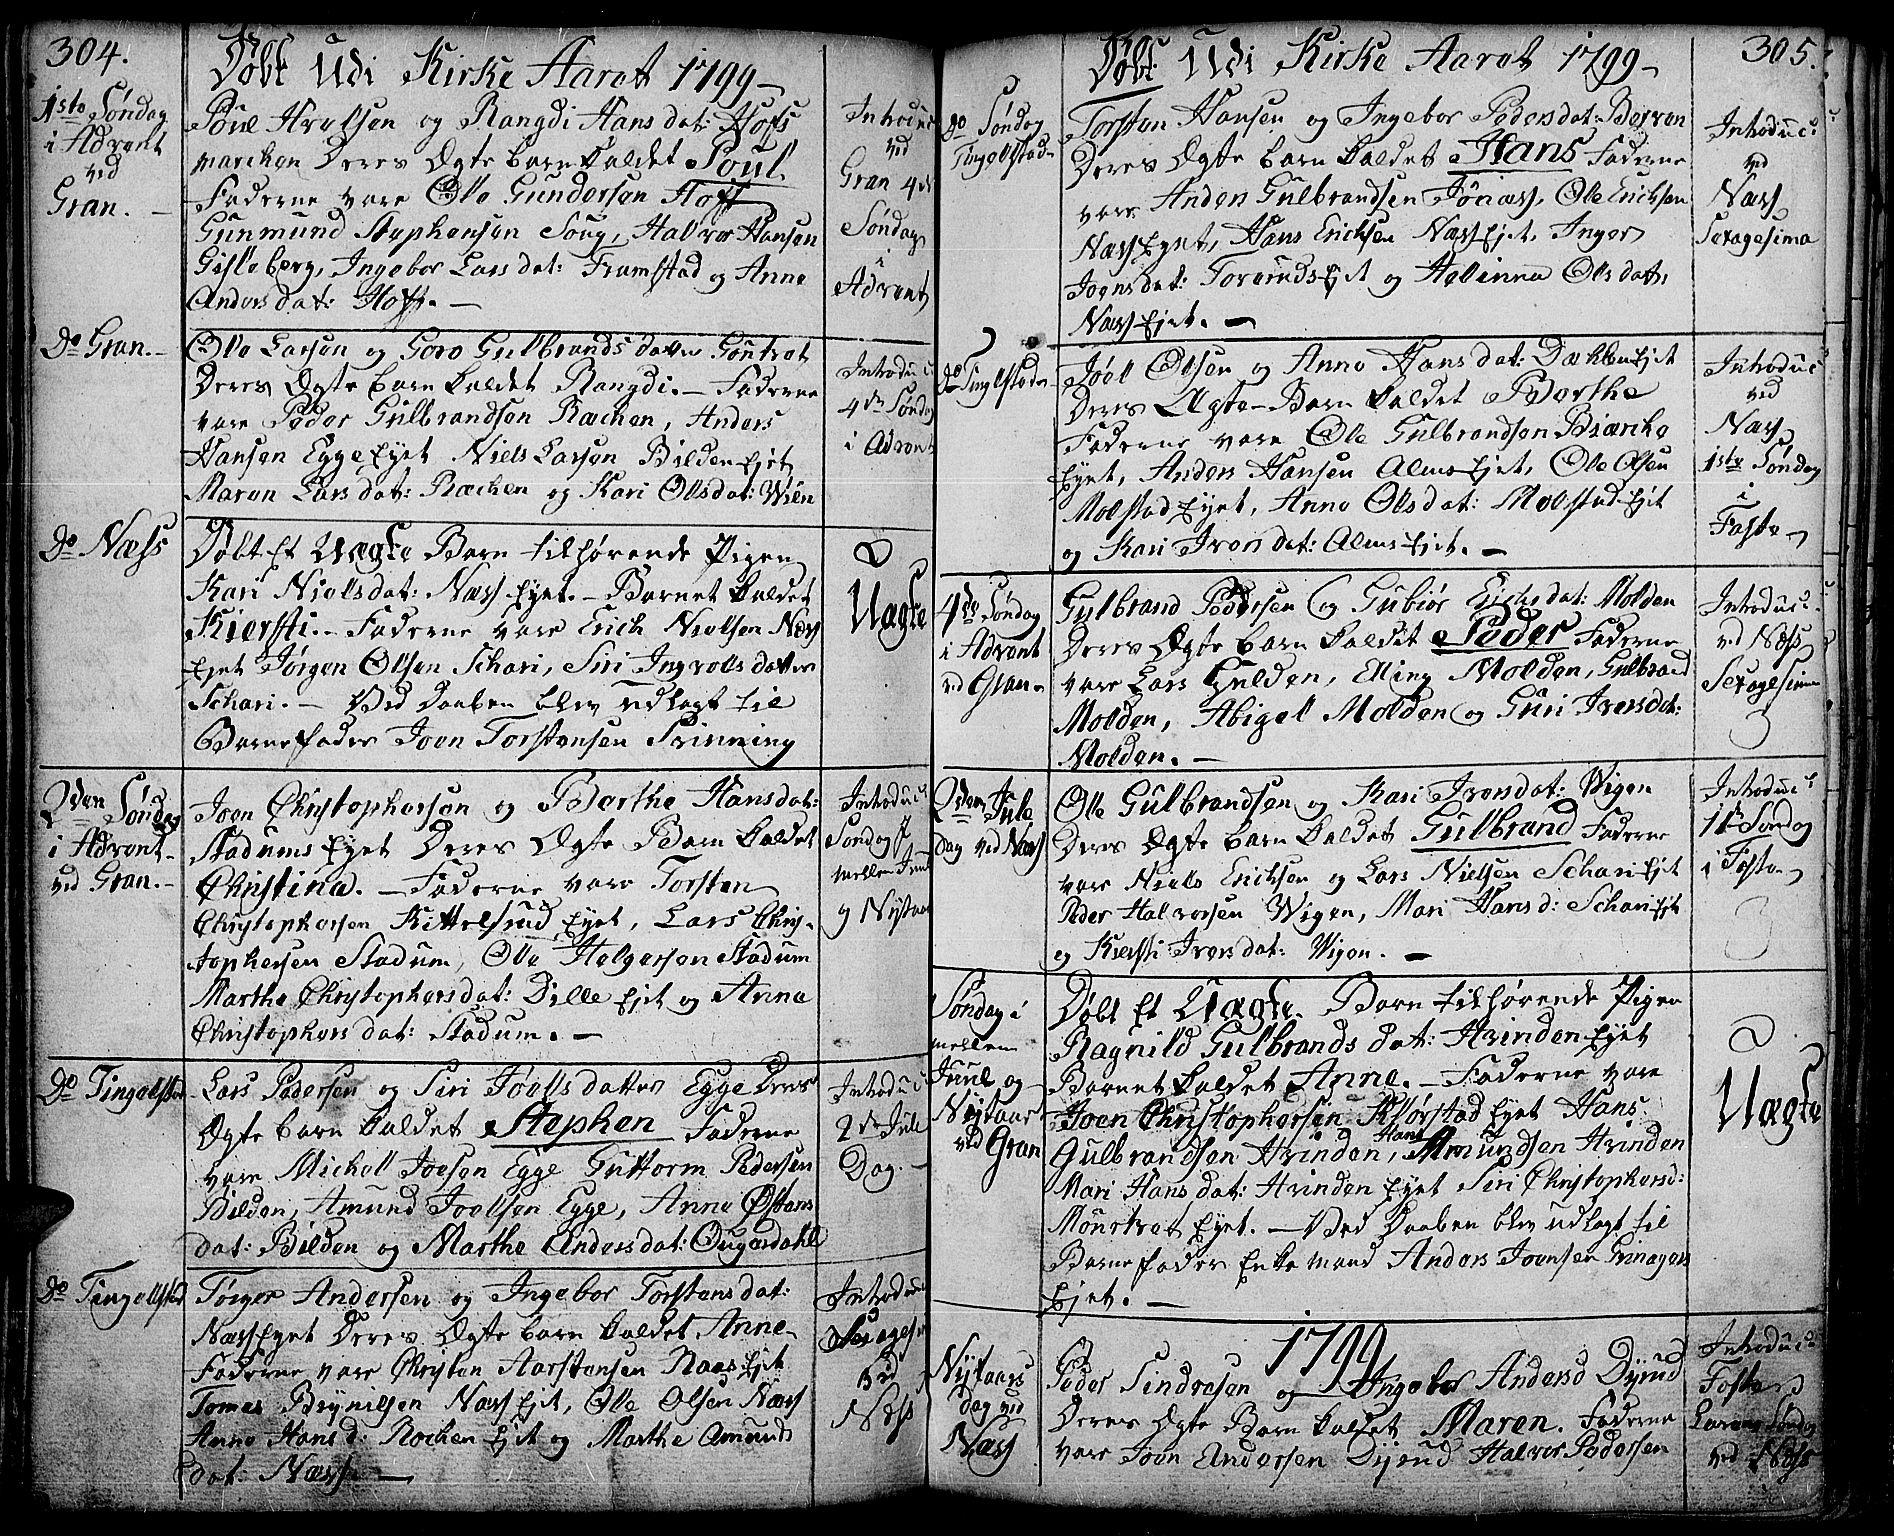 SAH, Gran prestekontor, Ministerialbok nr. 6, 1787-1824, s. 304-305